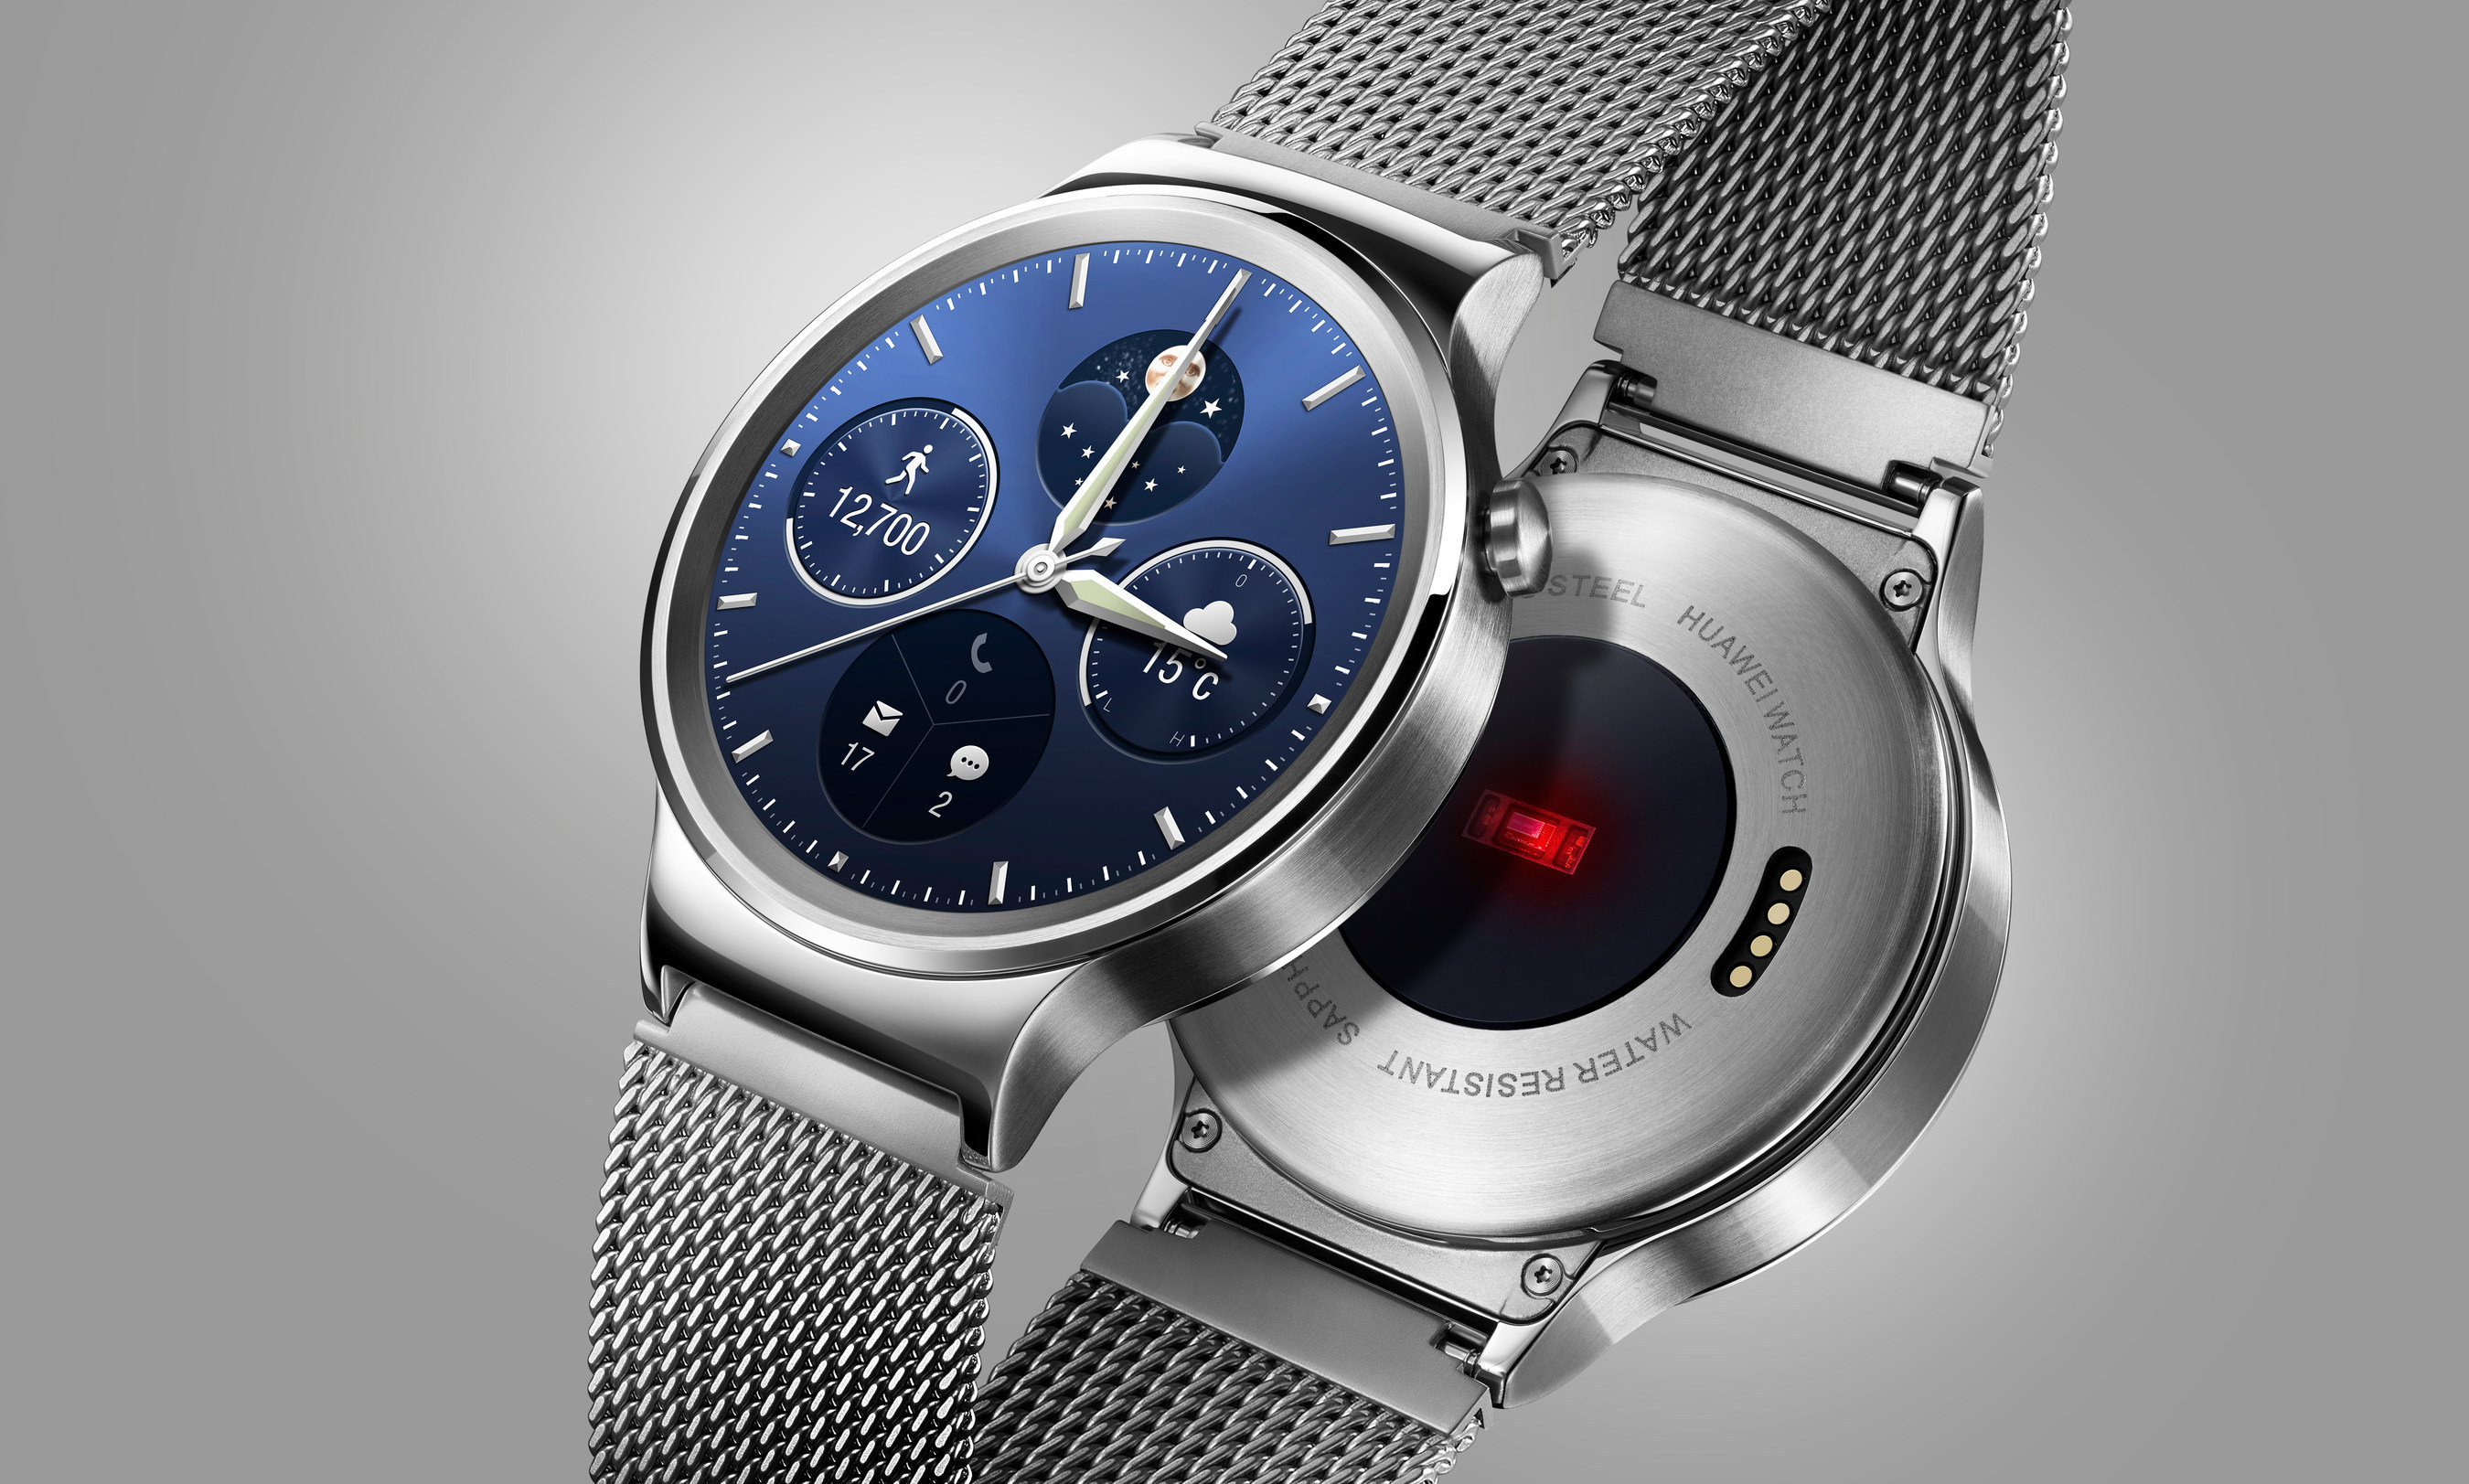 Huawei Watch recibe finalmente Android Wear 2.0